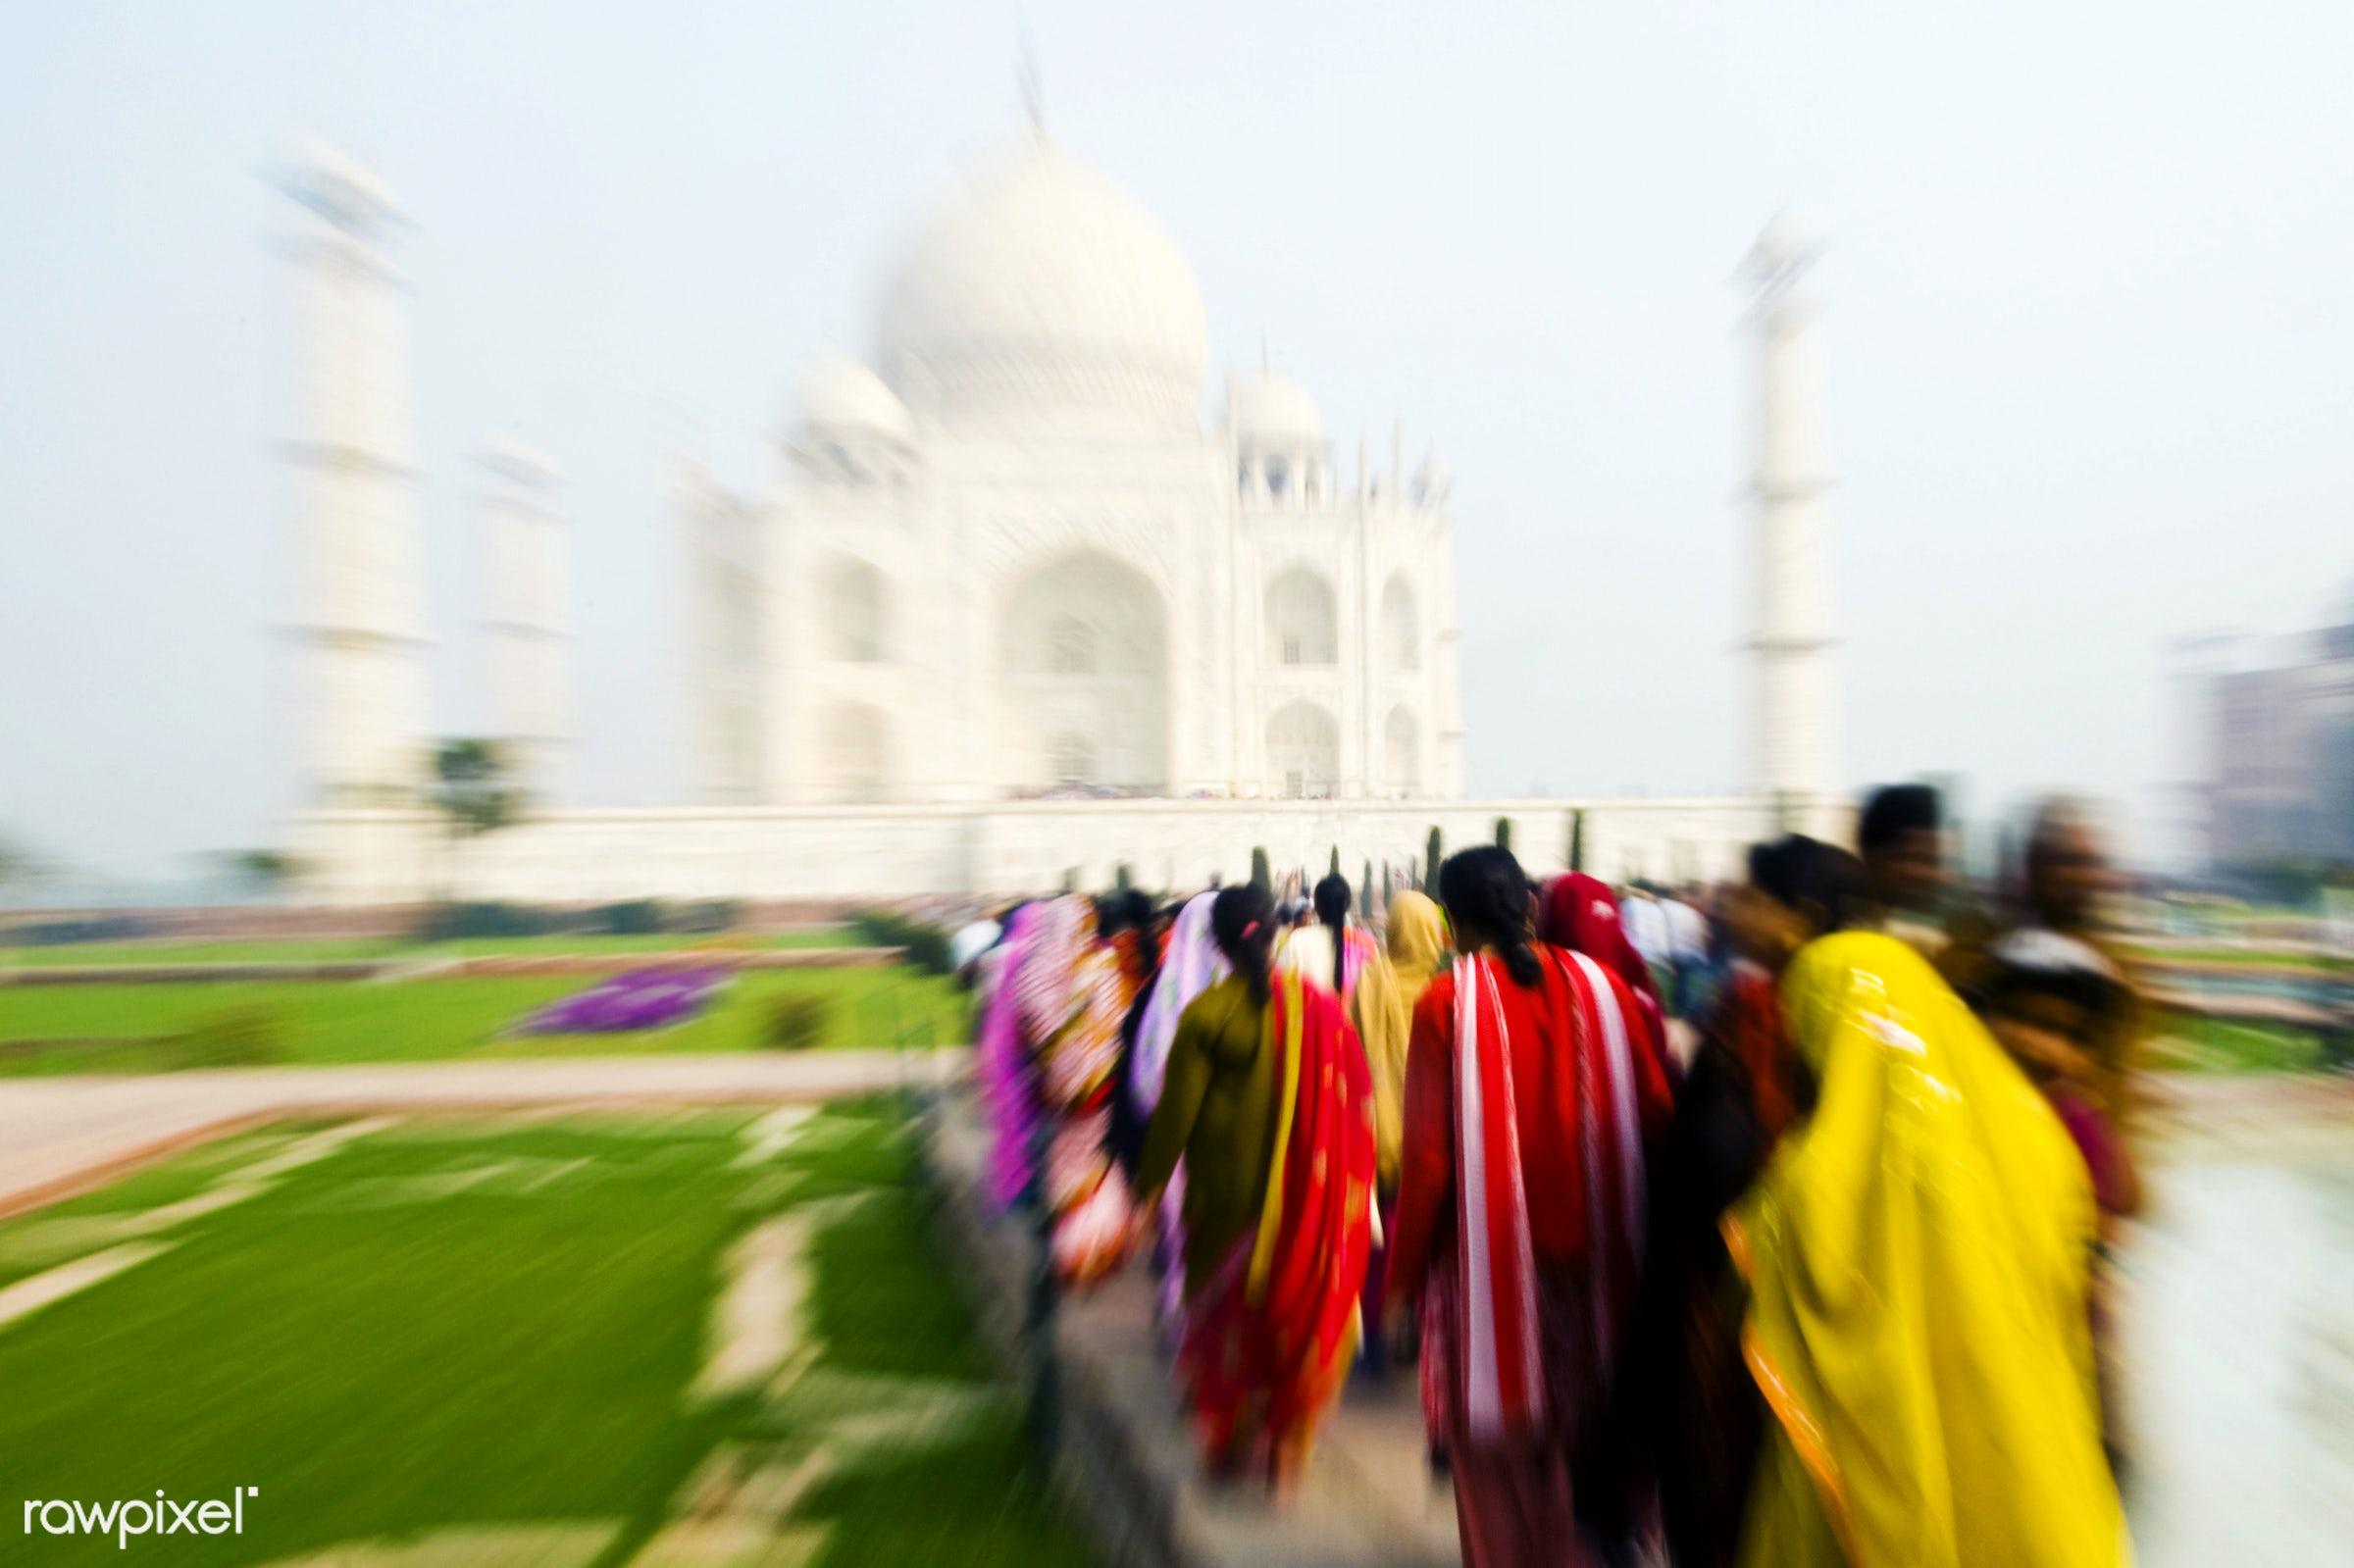 People walking to the Taj Mahal - 7 wonders, architectural styles, architecture, architecture and buildings, asia, blurred...